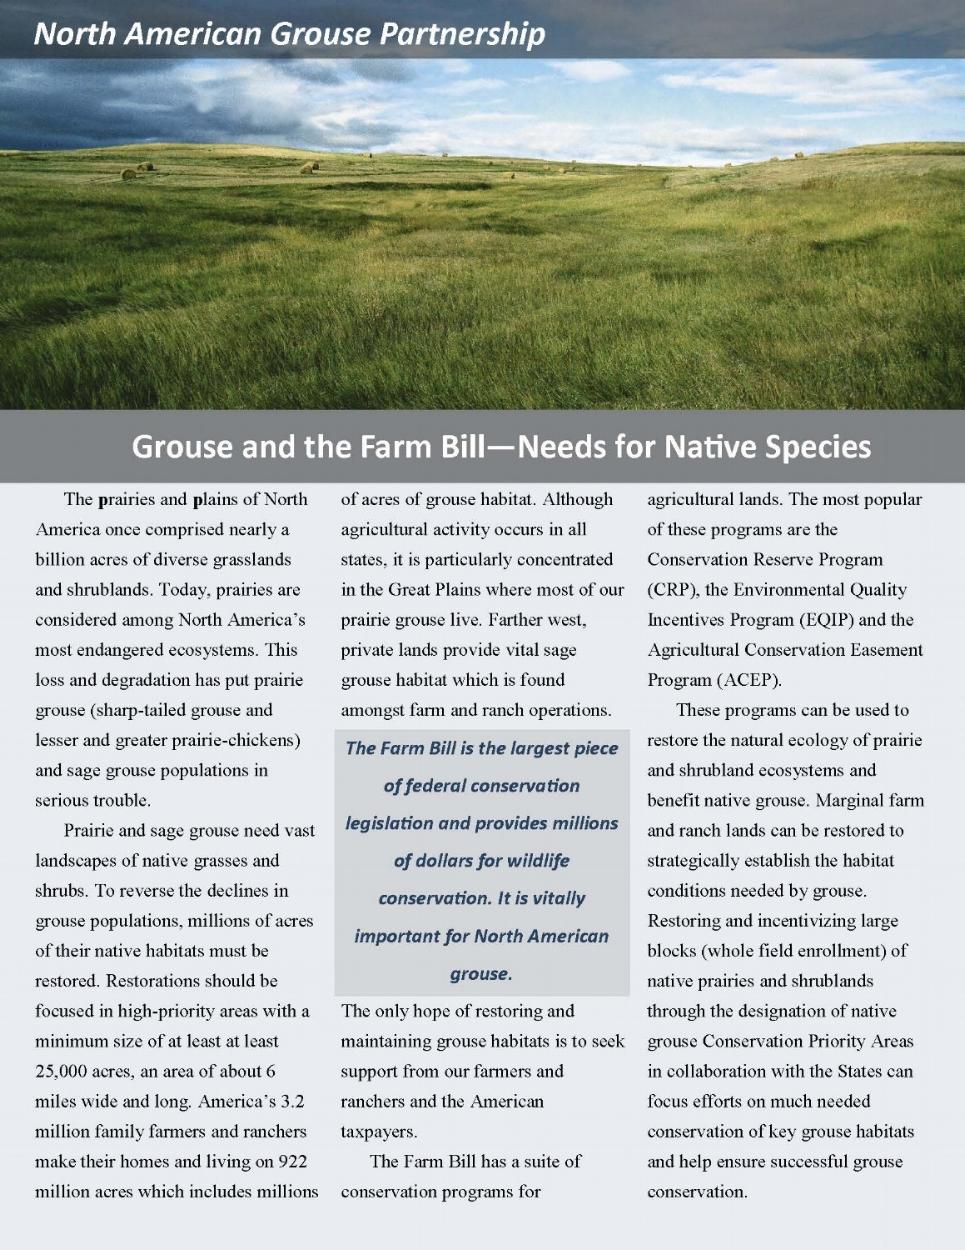 Farm Bill Brochure cover image.jpg